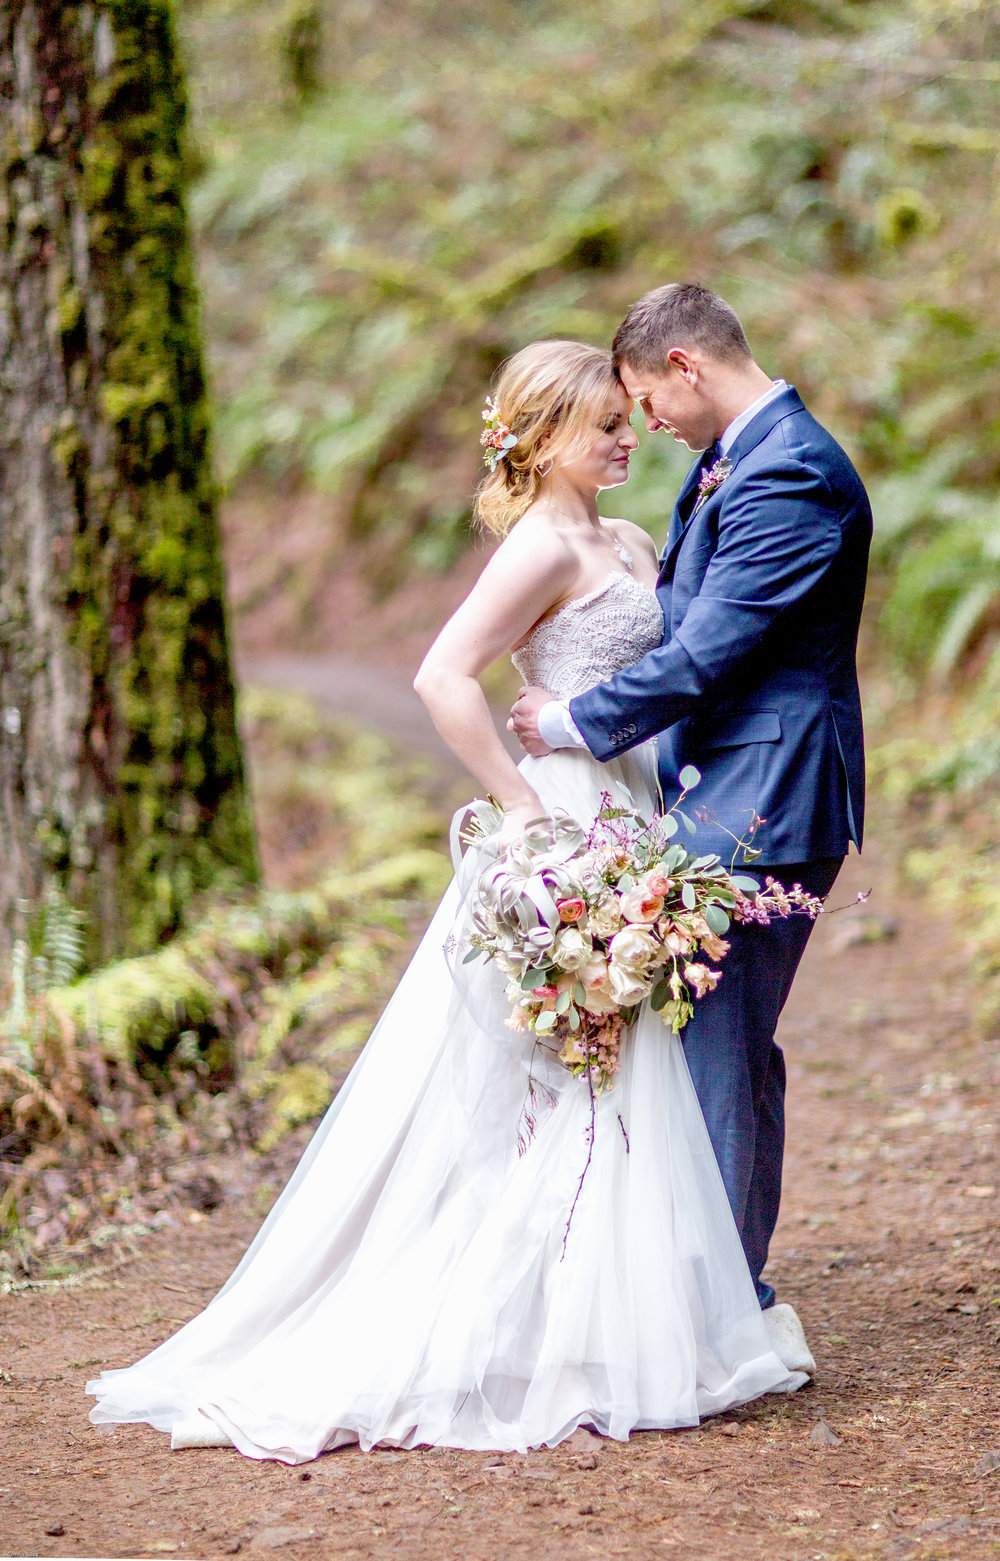 Silver Falls-elopement-bride-and-groom-photo Corina Silva Studios-73.jpg